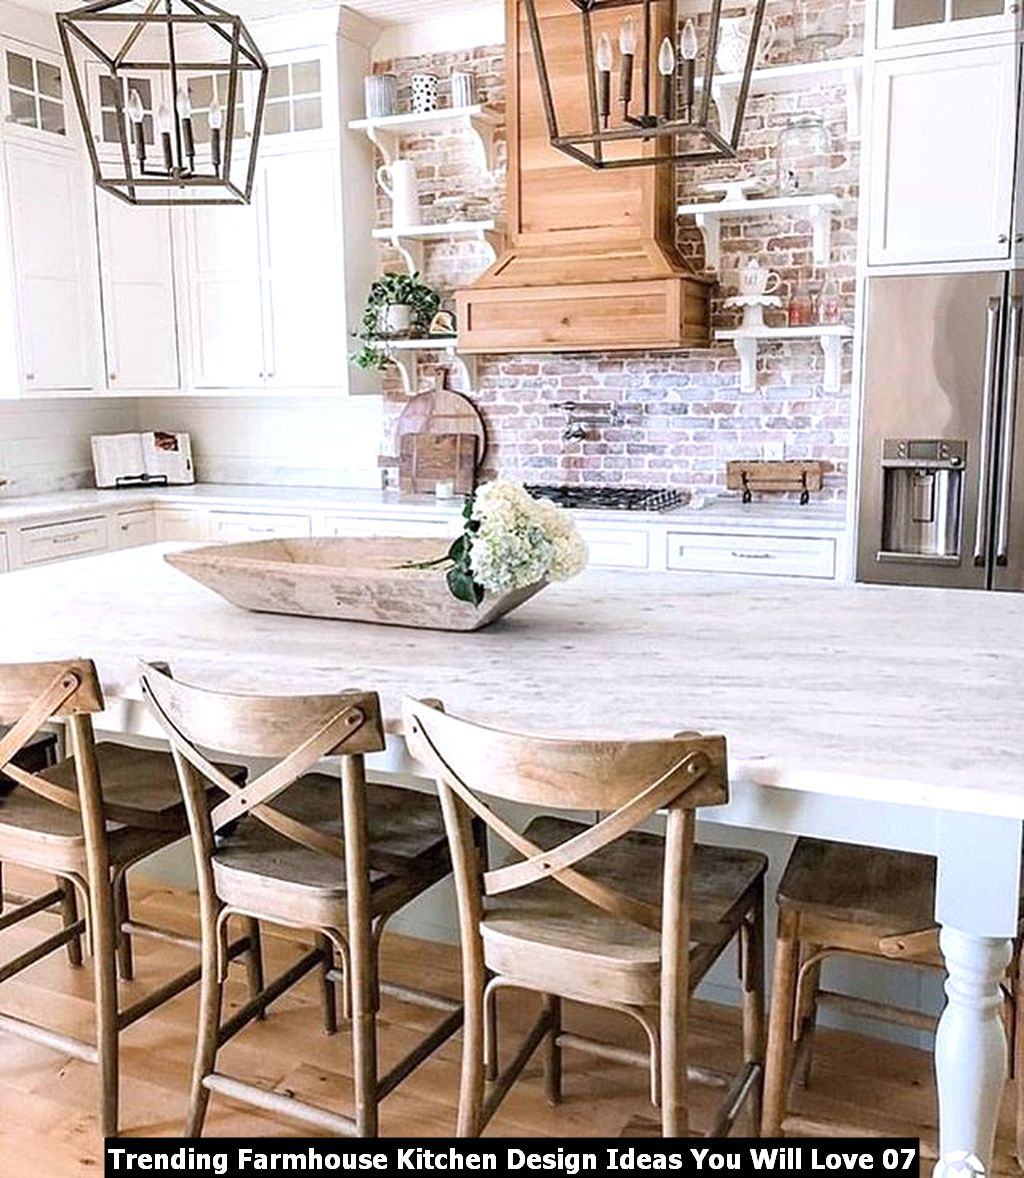 Trending Farmhouse Kitchen Design Ideas You Will Love 07